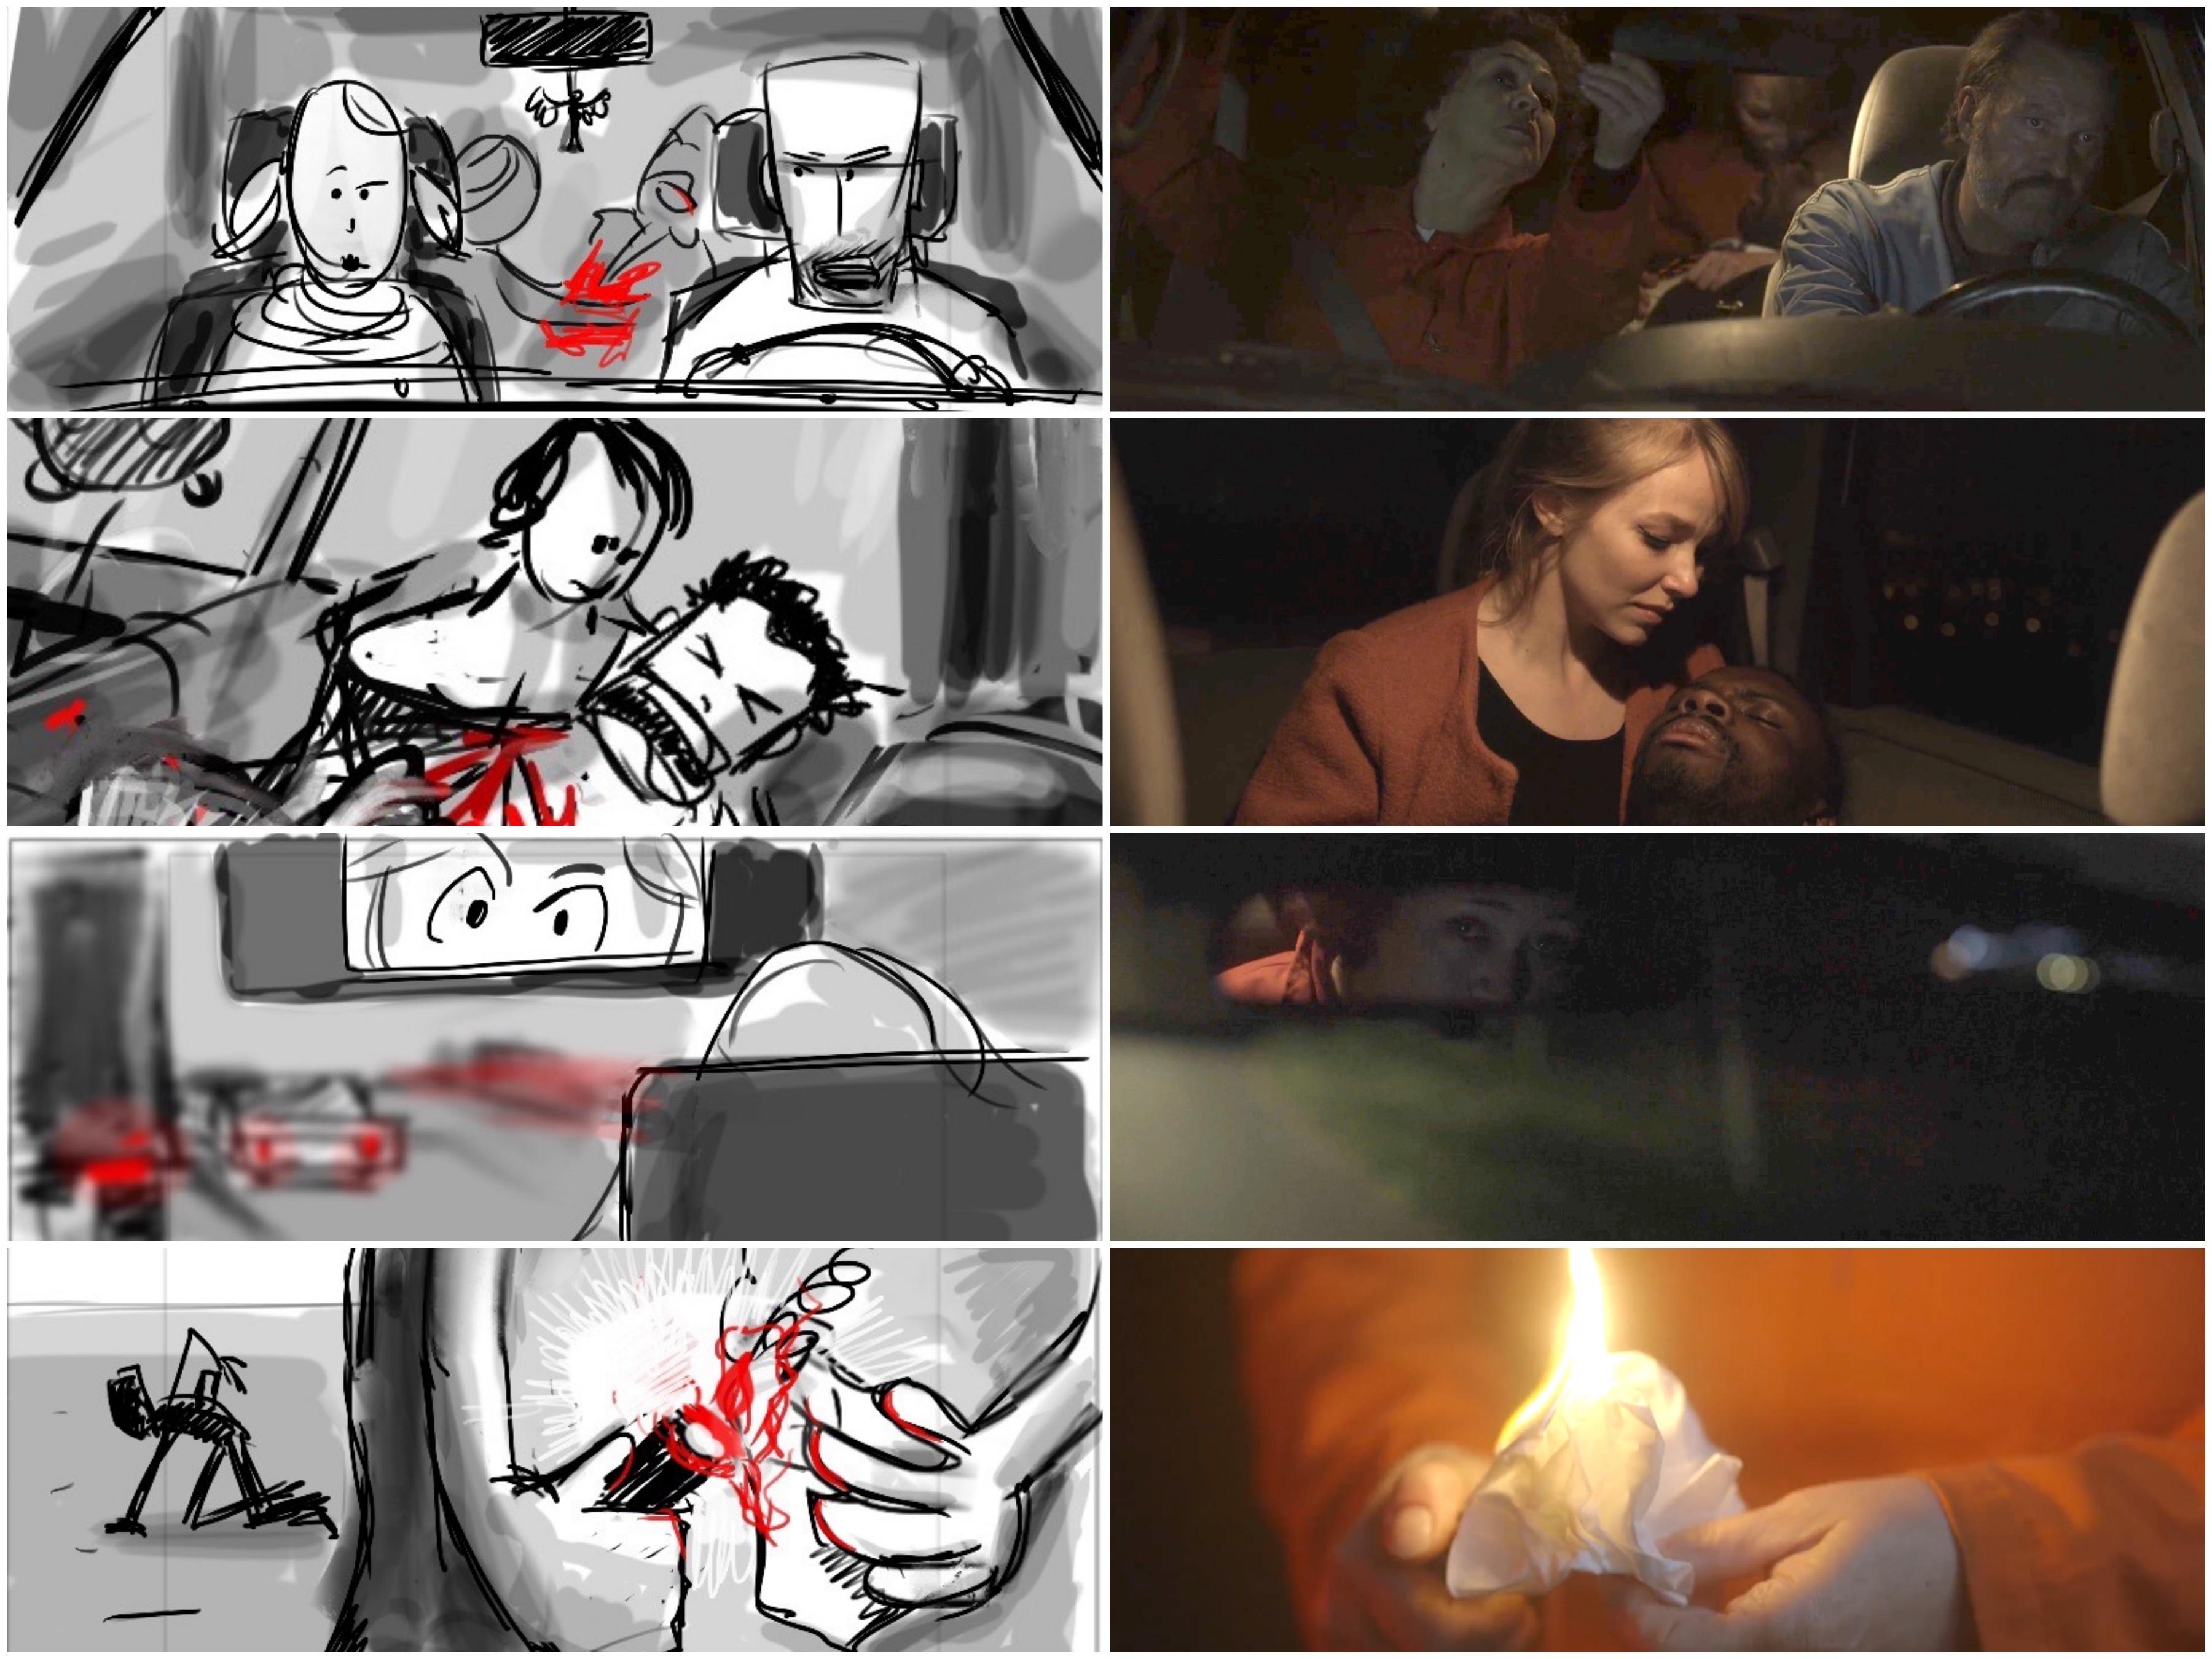 kh-collage-1